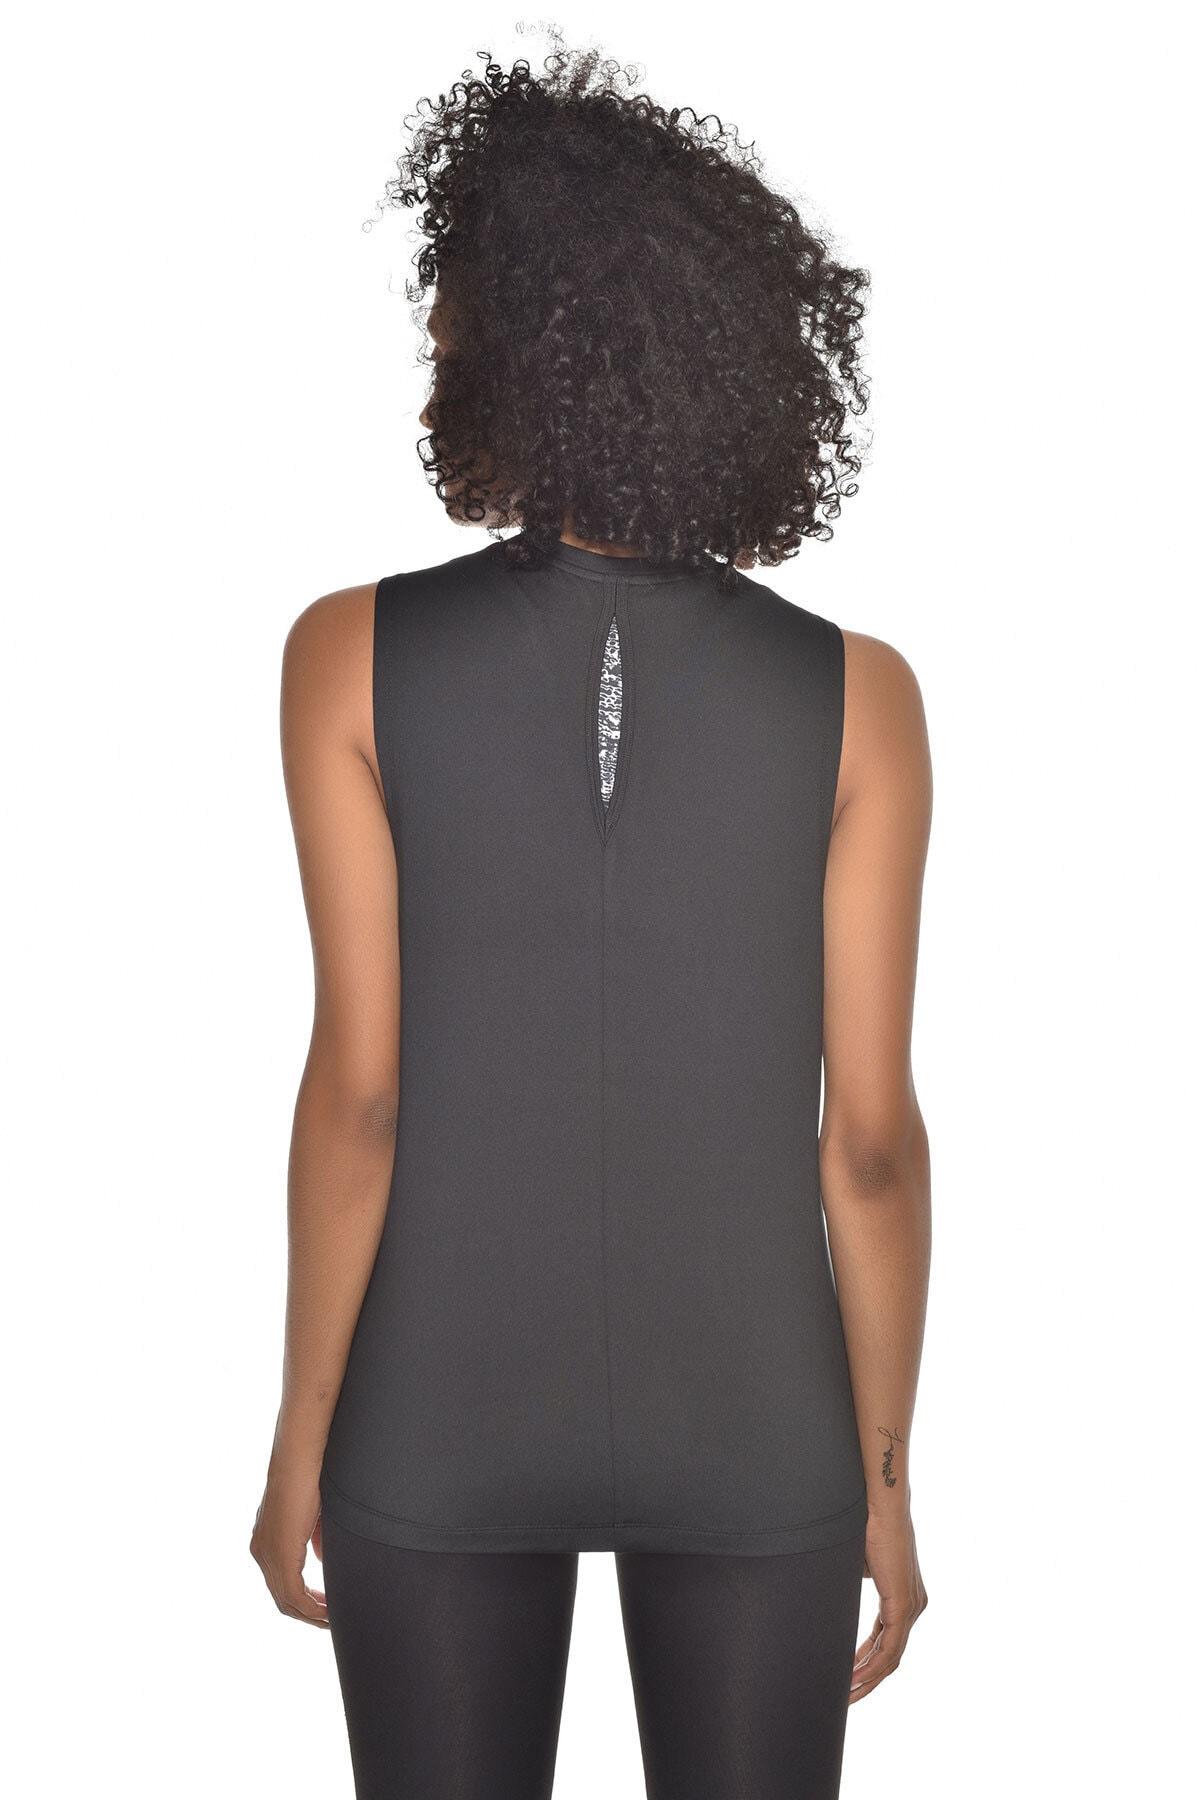 bilcee Kadın Siyah Bra Üstü Atlet GW-9205 2